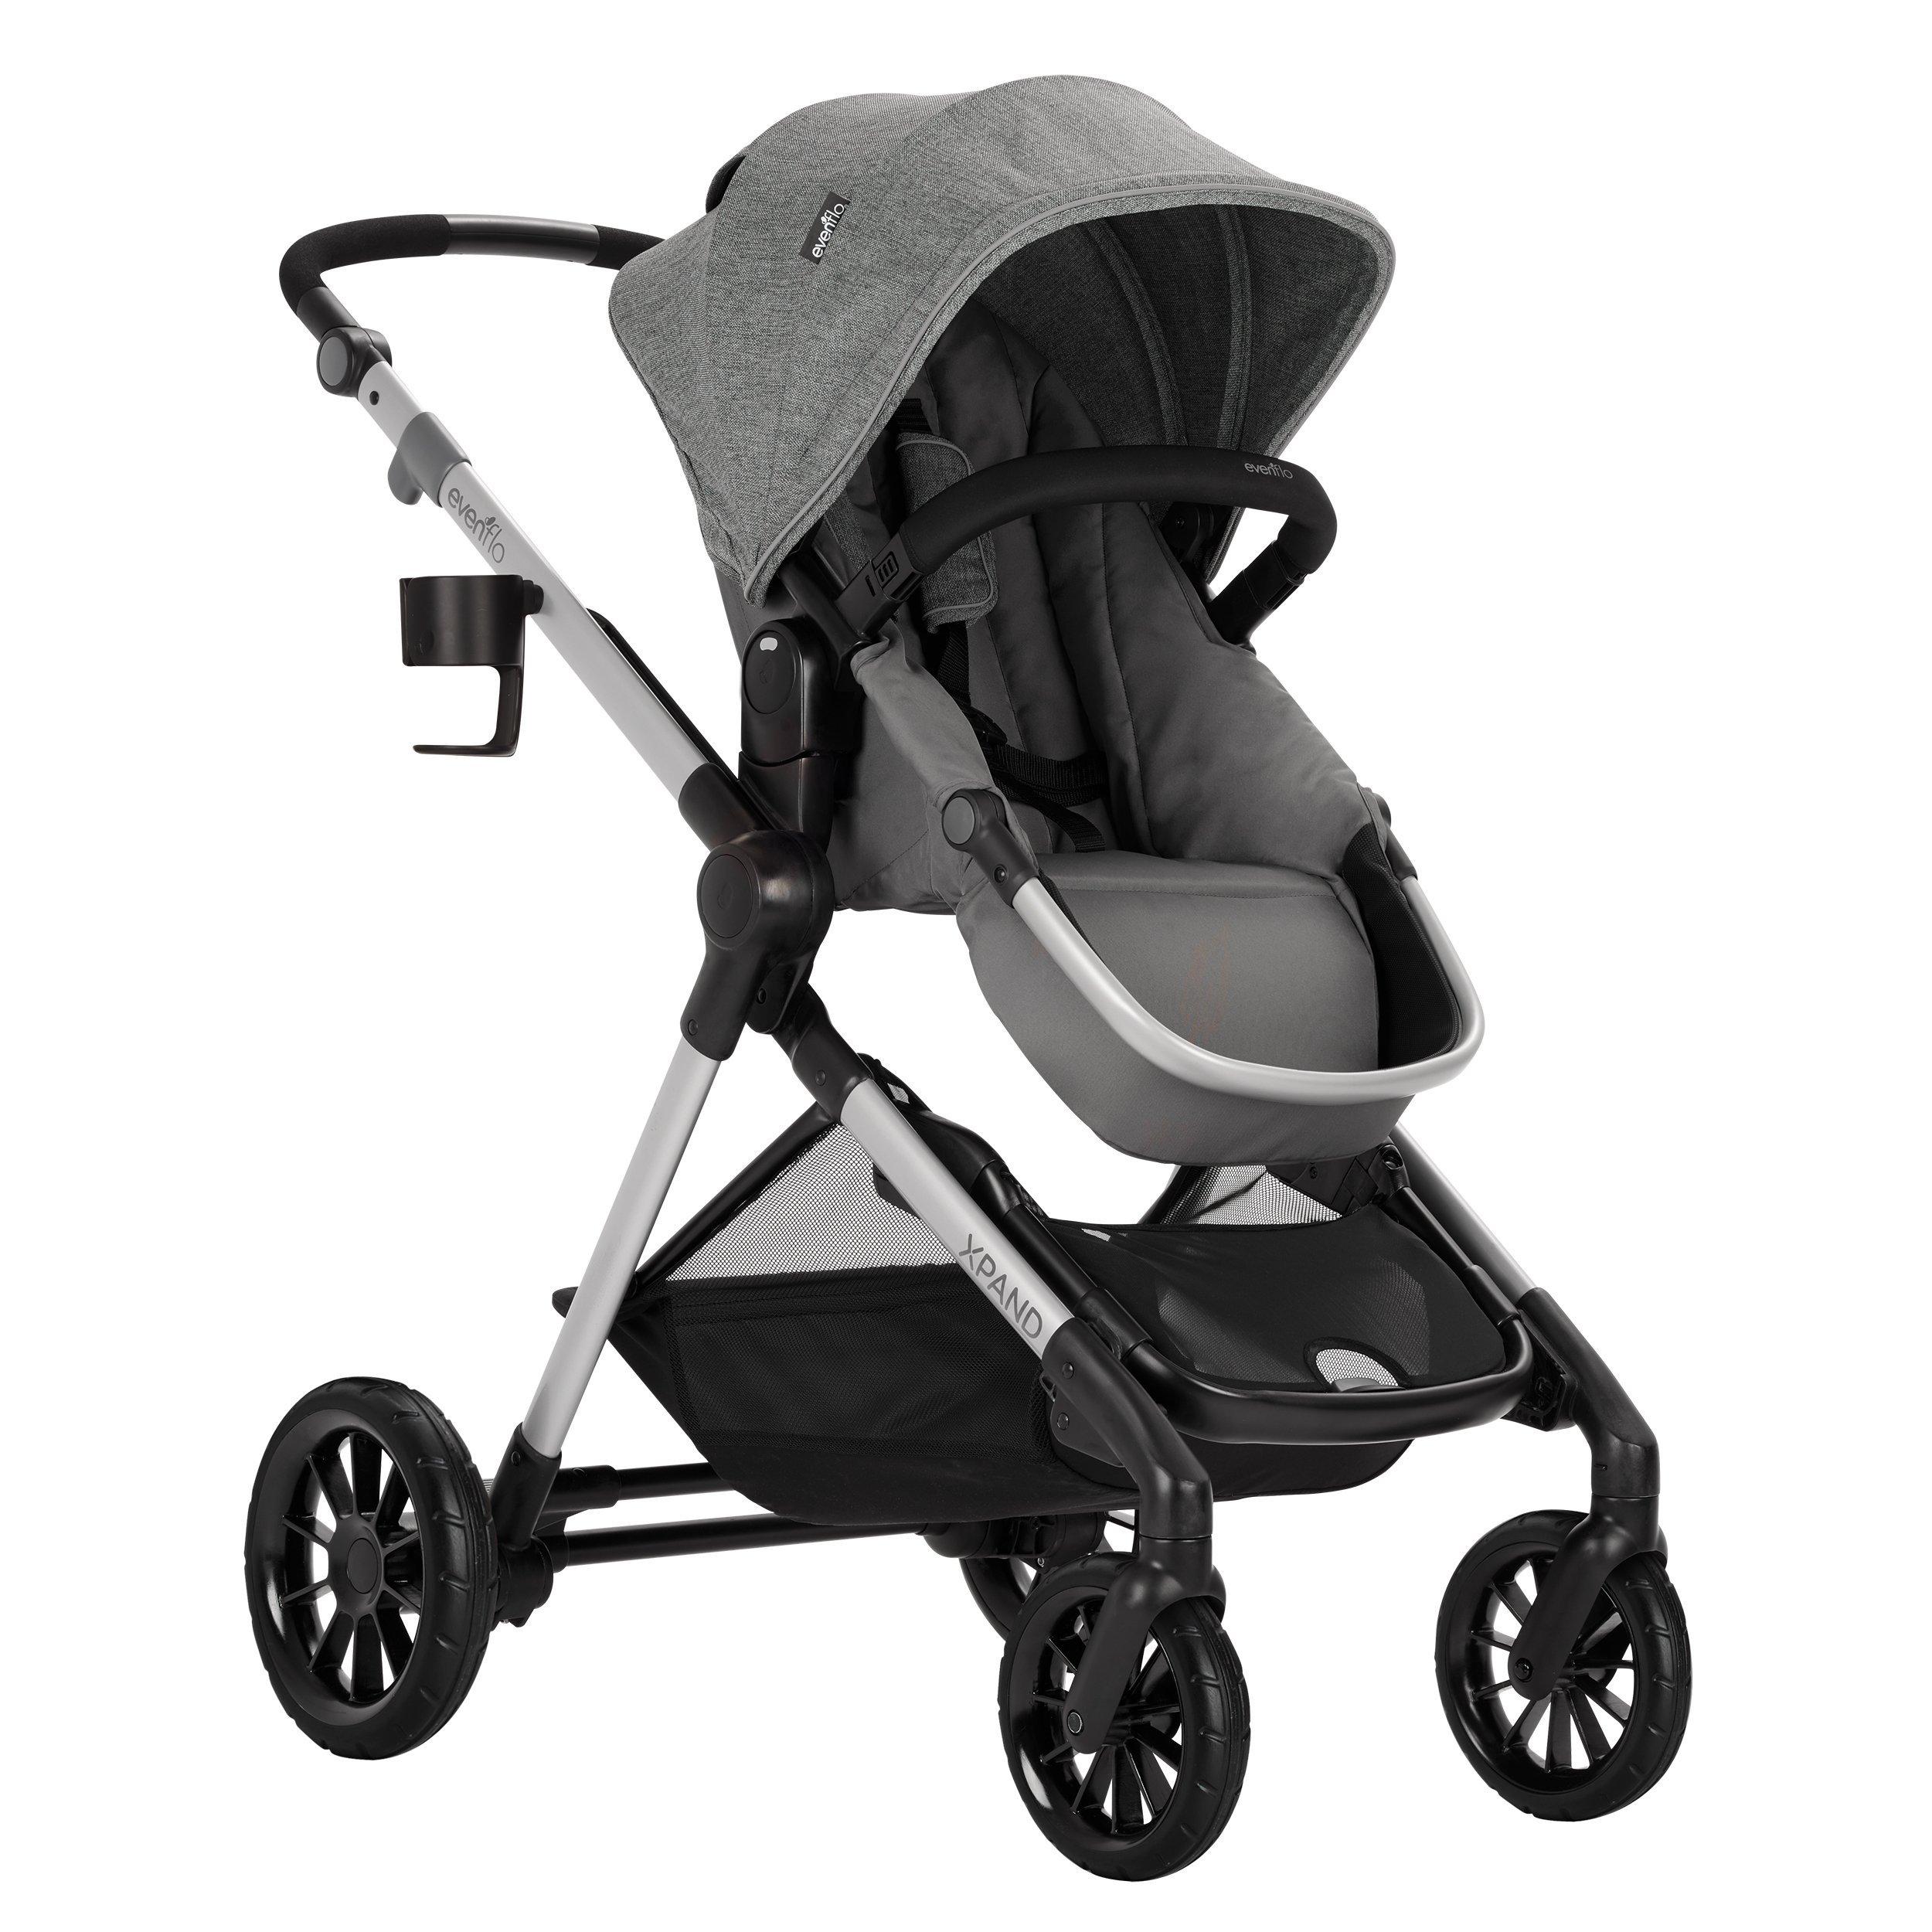 Evenflo Pivot Xpand Modular Stroller, Baby Stroller, Converts to Double Stroller, 4 Modes, Durable Construction, Extra-Large Storage Basket, Compact Folding Design, 55-lb Capacity, Percheron Gray by Evenflo